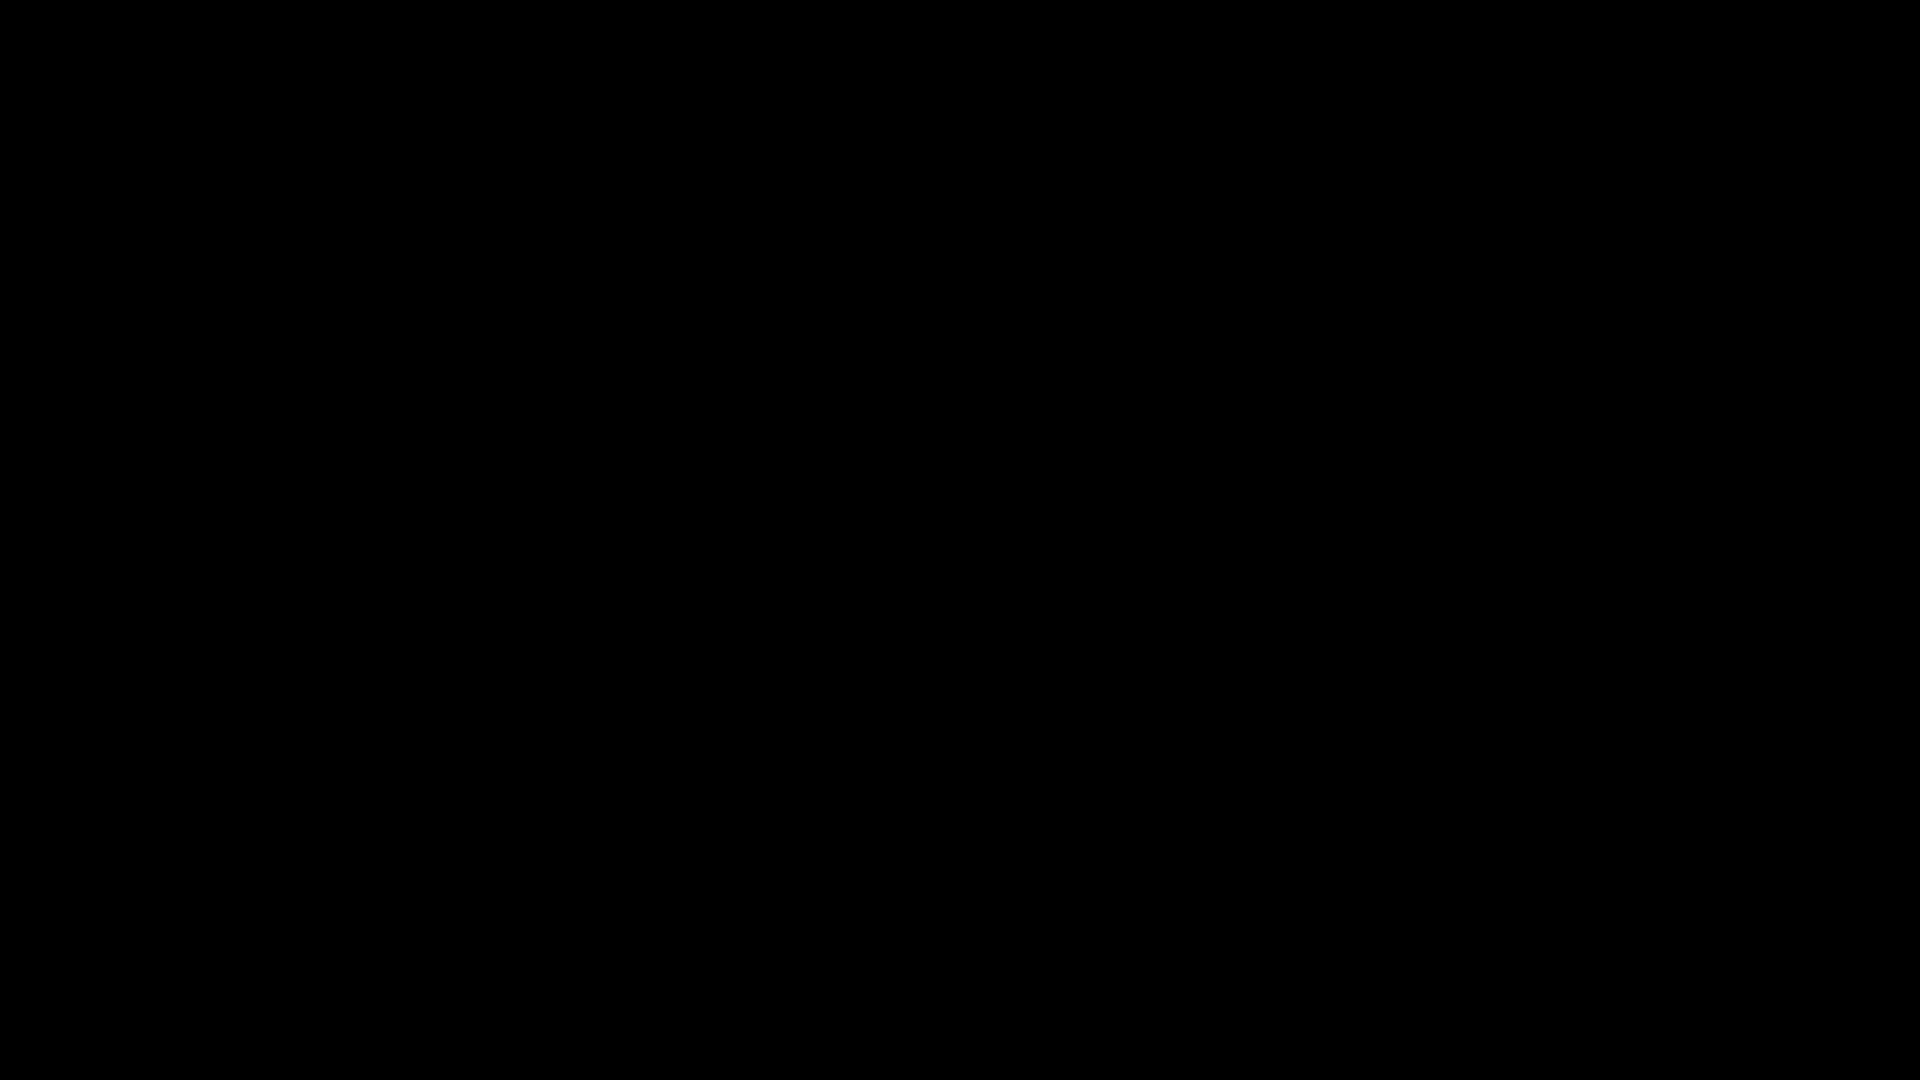 2012, commentary, compeditive, computer, dk, dota, dota 2, dota2, esports, game, international, jd, join, joindota, shoutcast, slesh, the international, tobi wan, tobiwan, valve, The International 2012 - Day 2: Dendi dances on stage GIFs